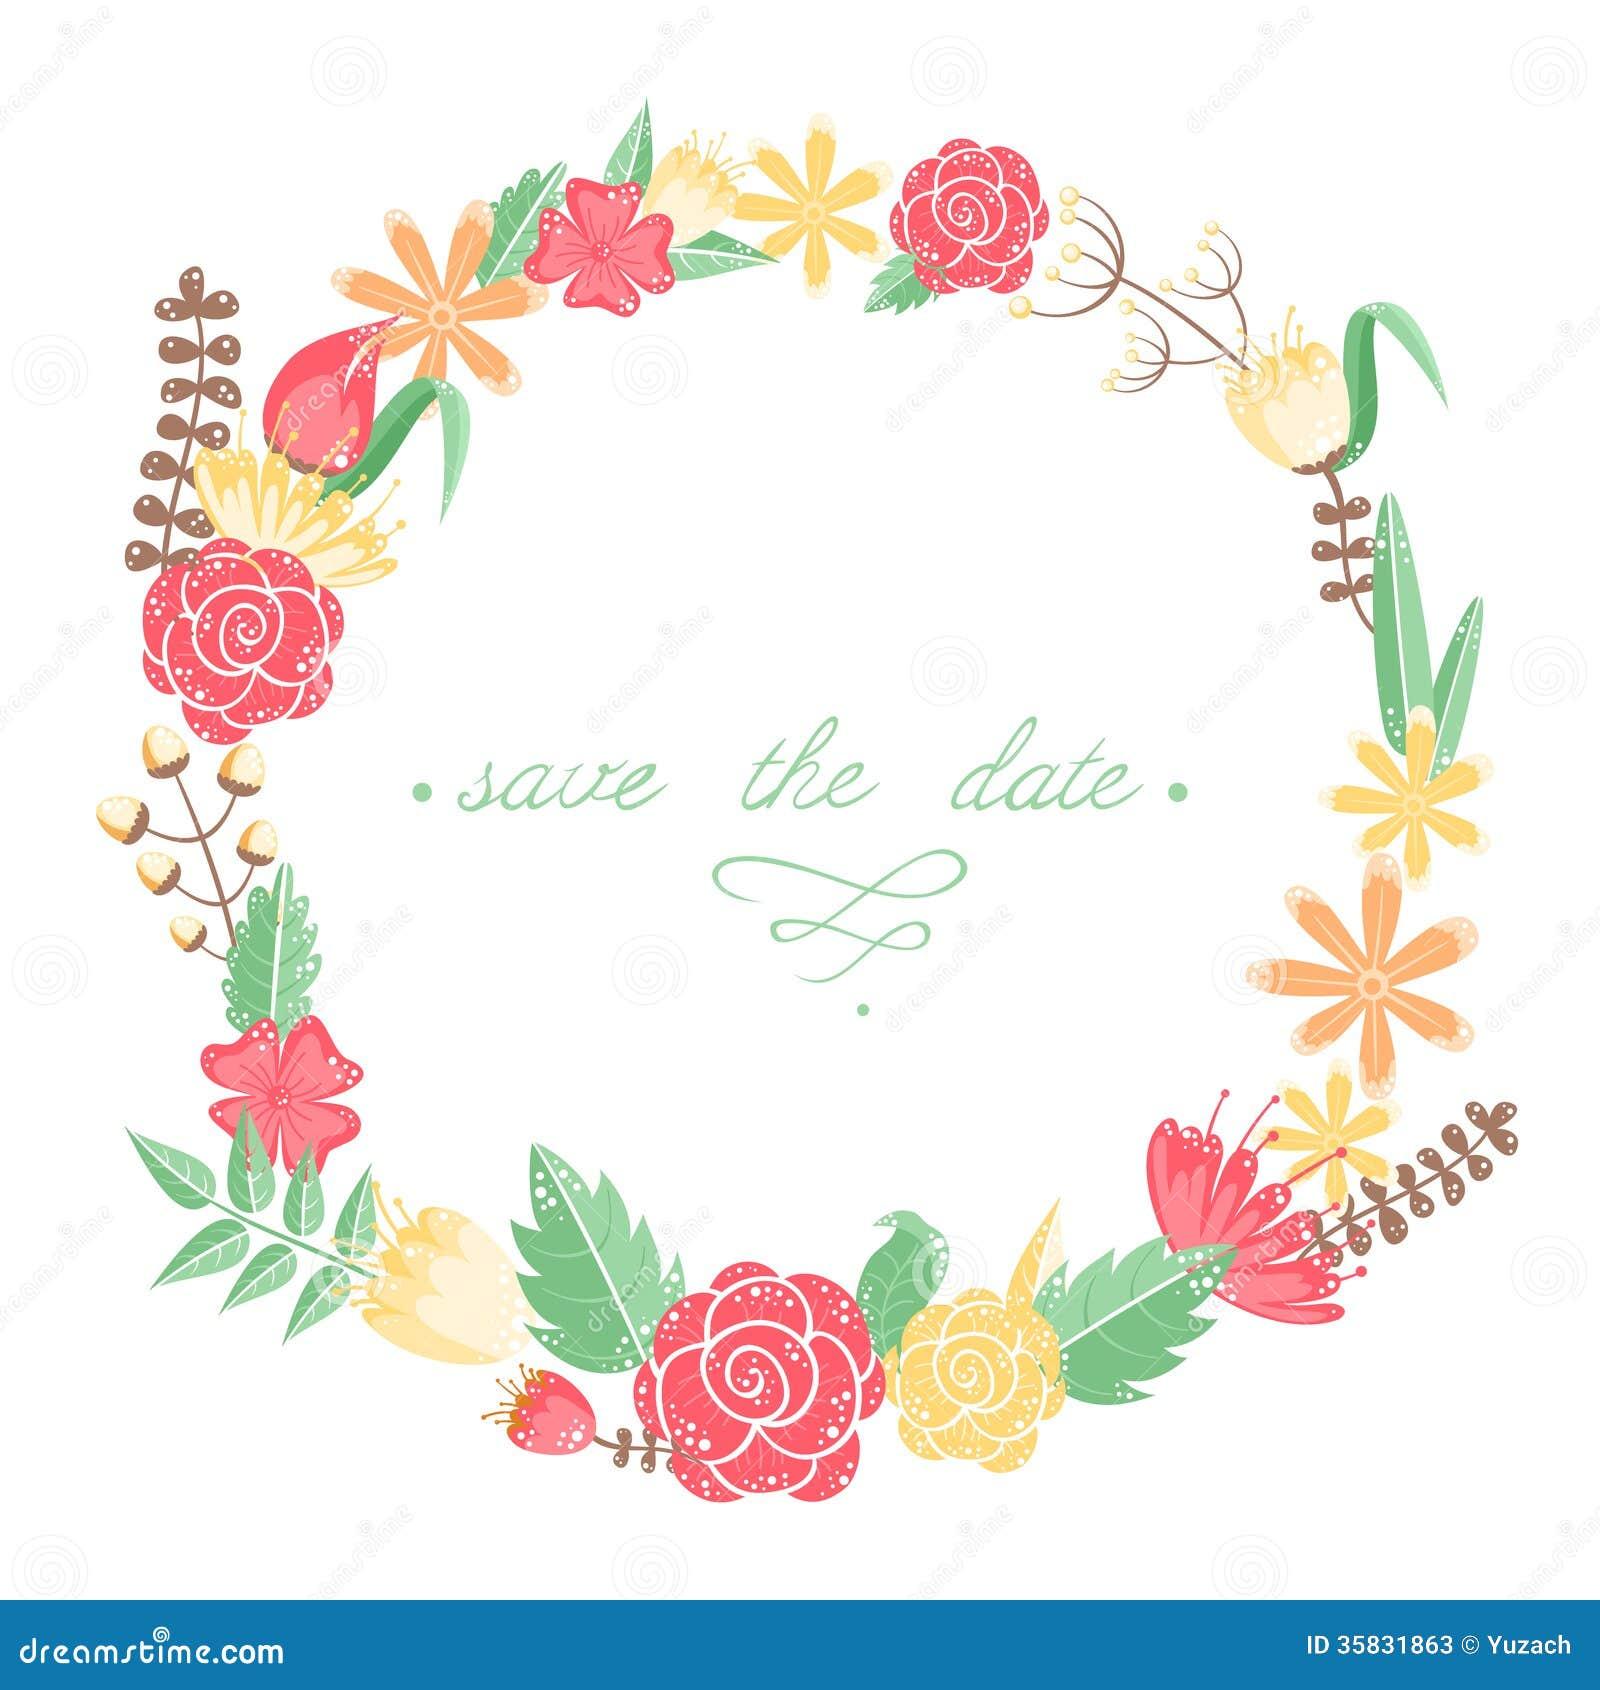 Elegant designs of congratulation cards